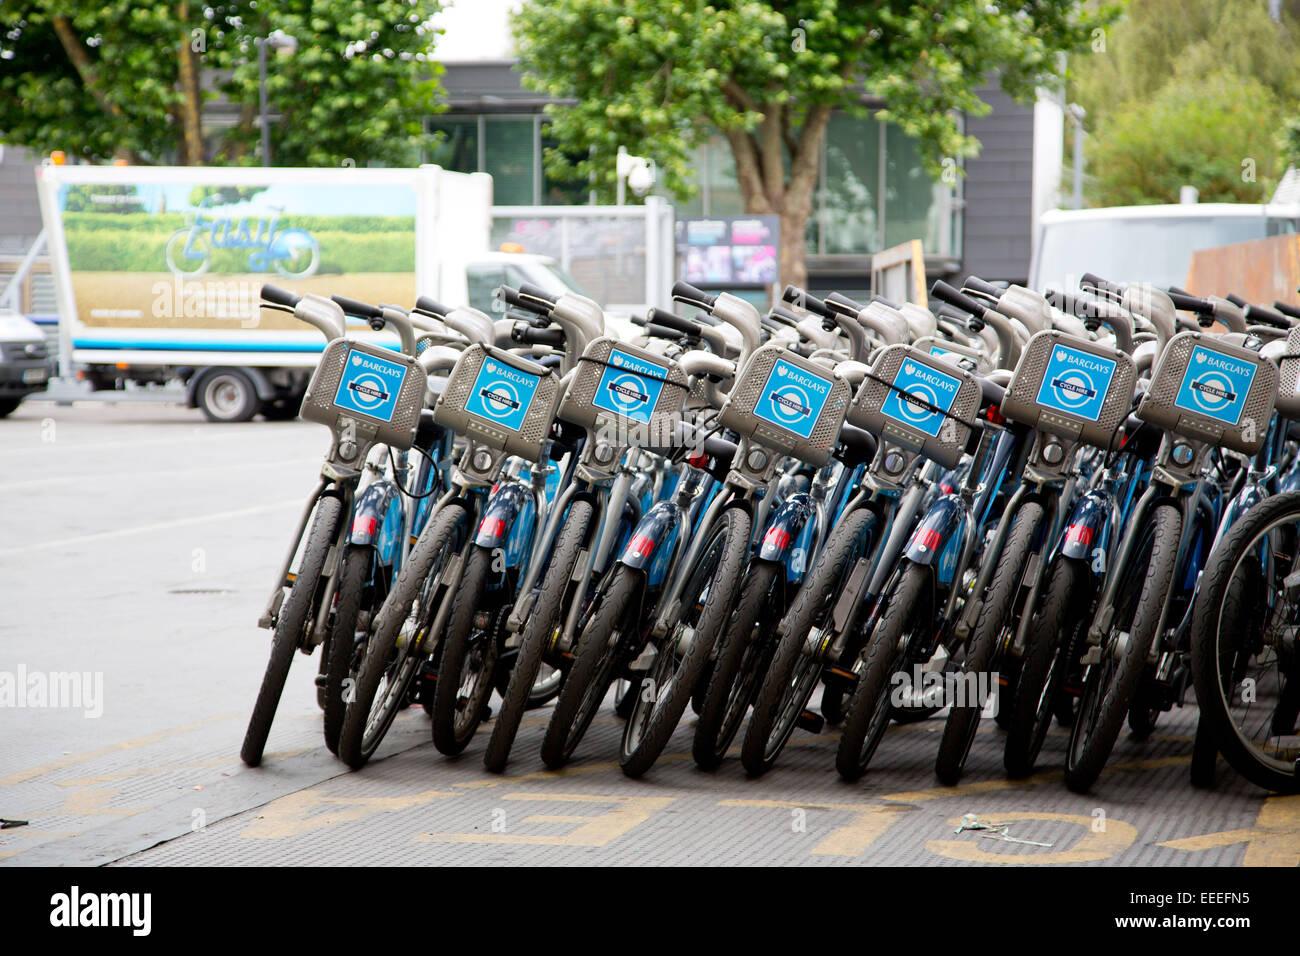 Stapel von reparierten Zyklus mieten Fahrräder bei Penton Straße depot Stockbild